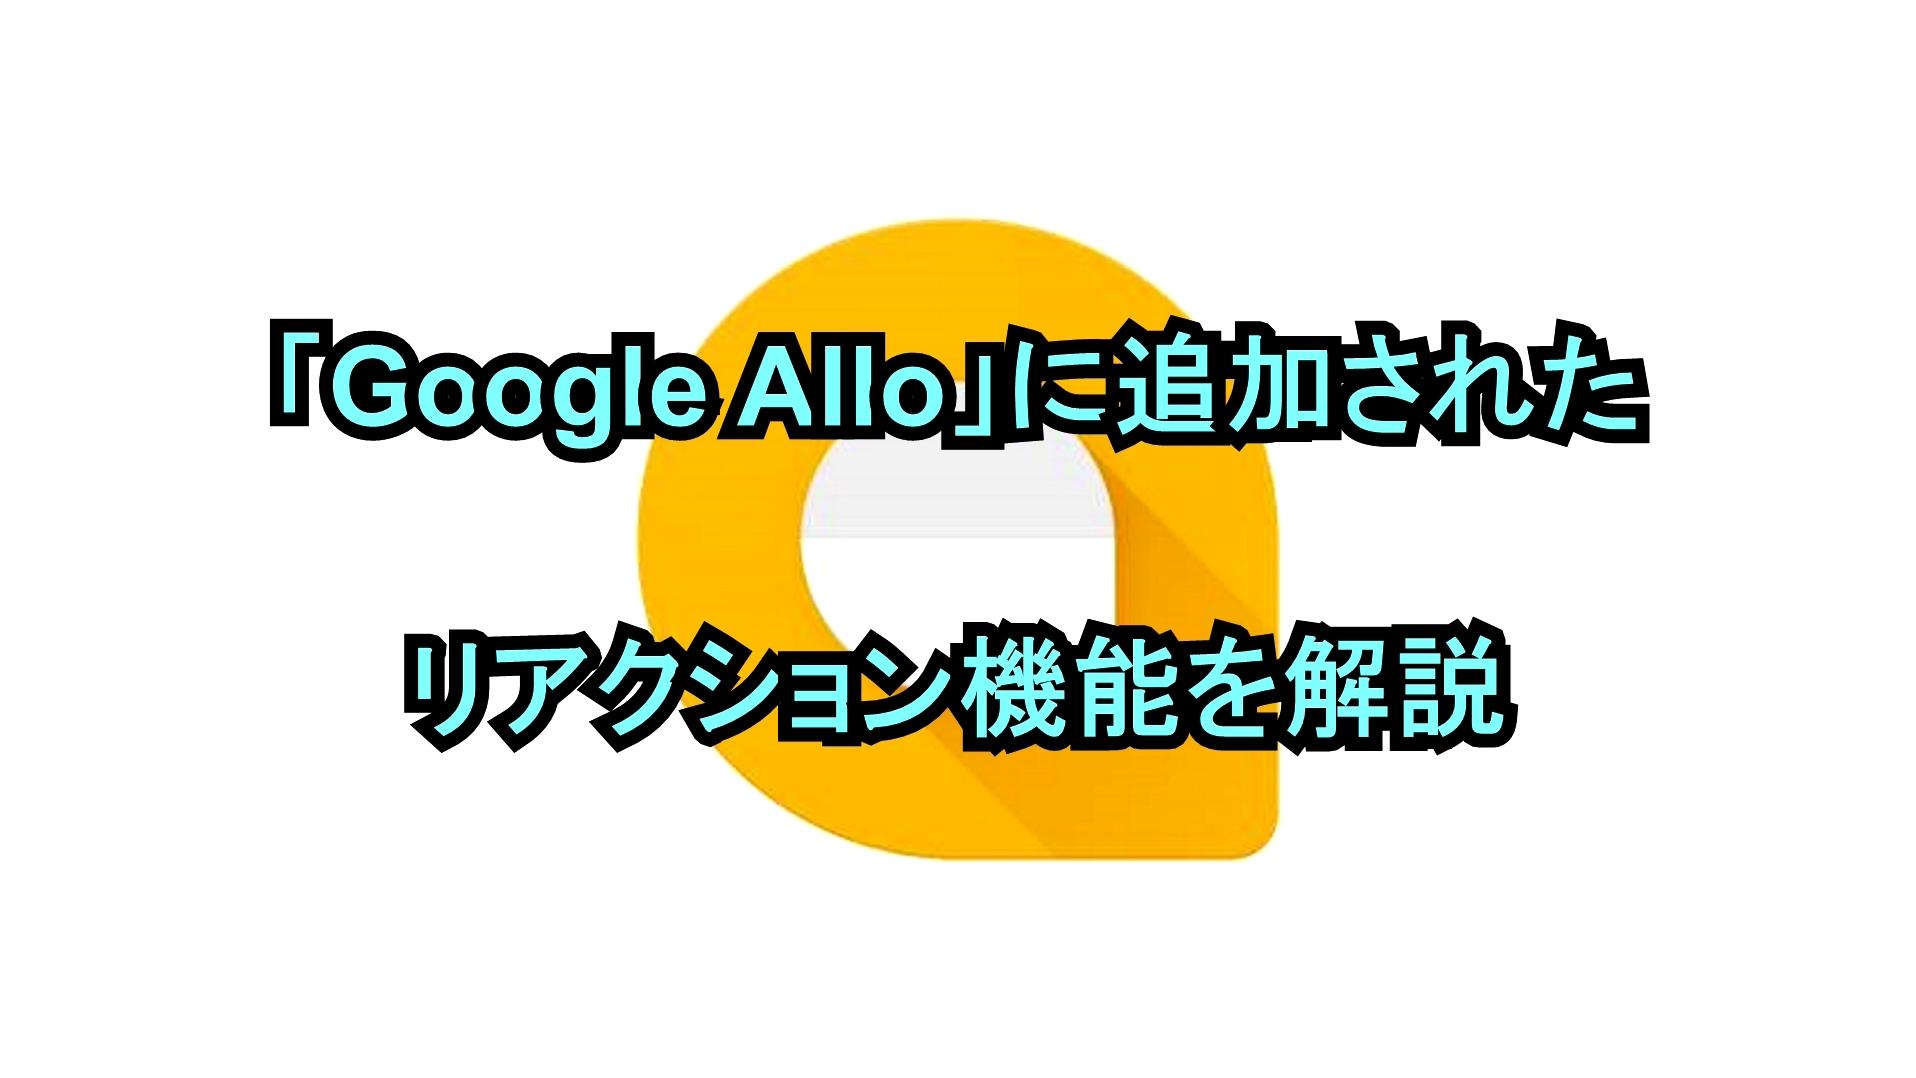 「Google Allo」に追加されたリアクション機能を解説